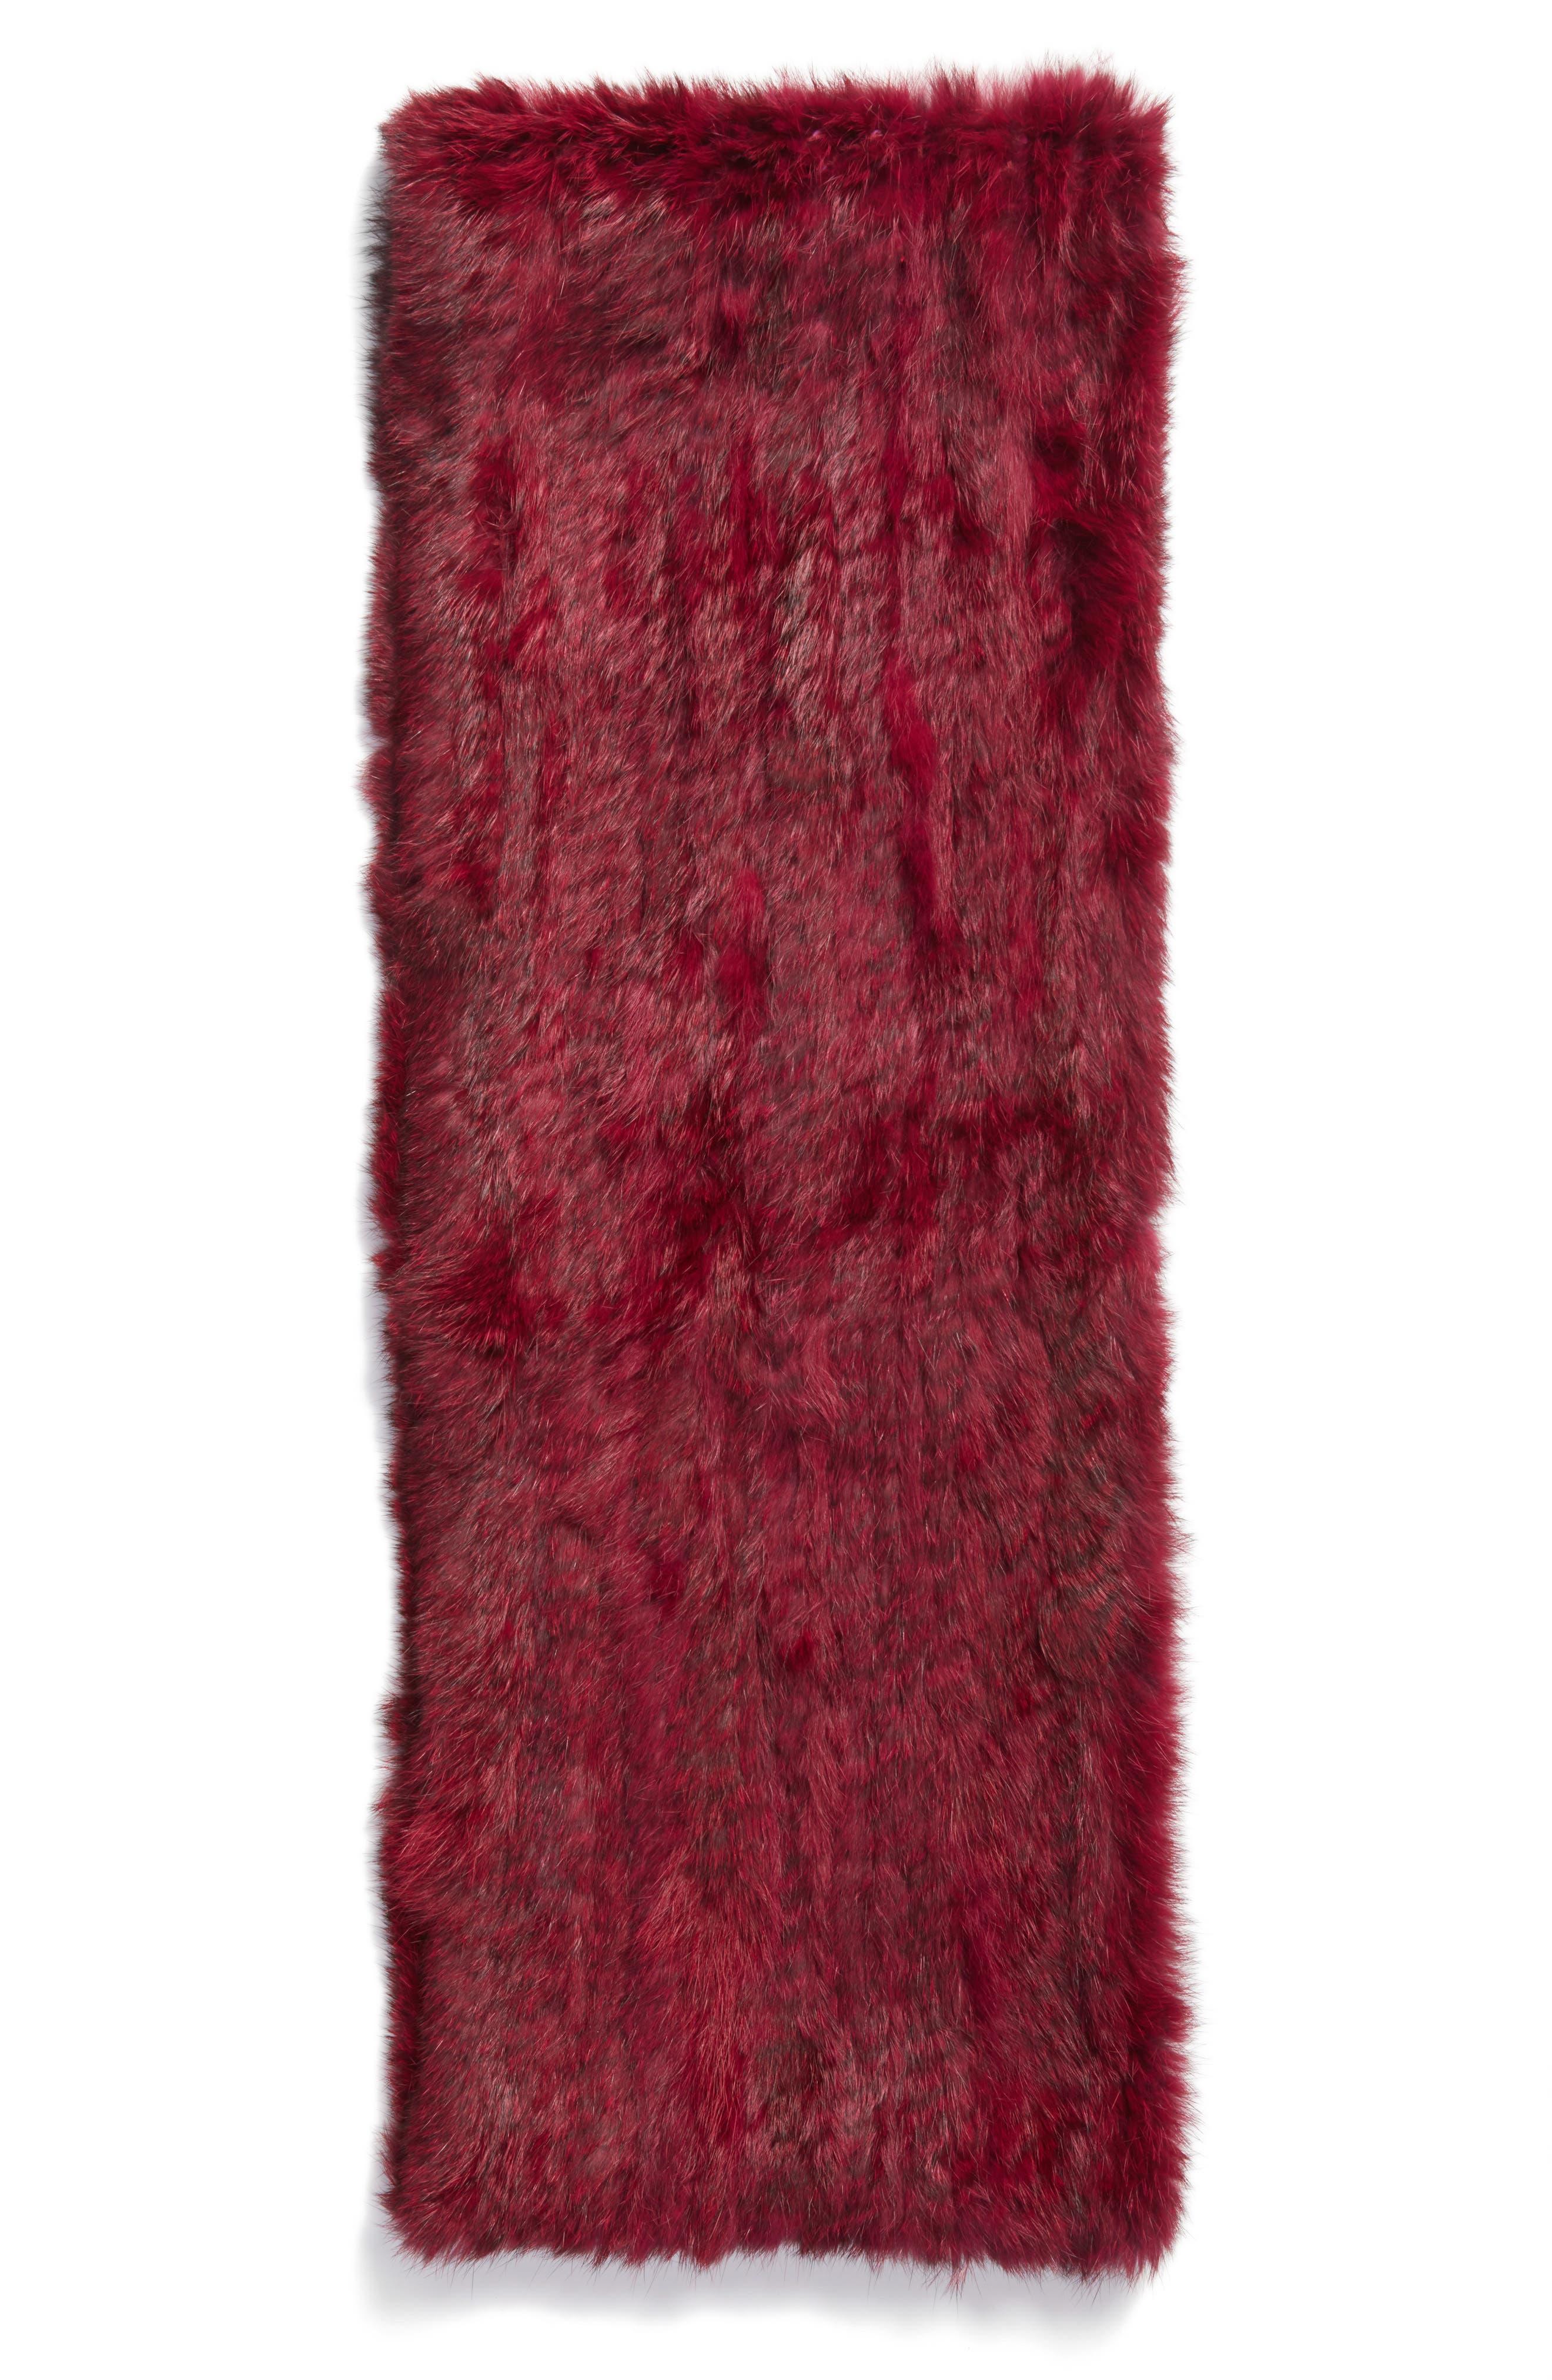 Overdyed Genuine Rabbit Fur Infinity Scarf,                             Alternate thumbnail 3, color,                             930